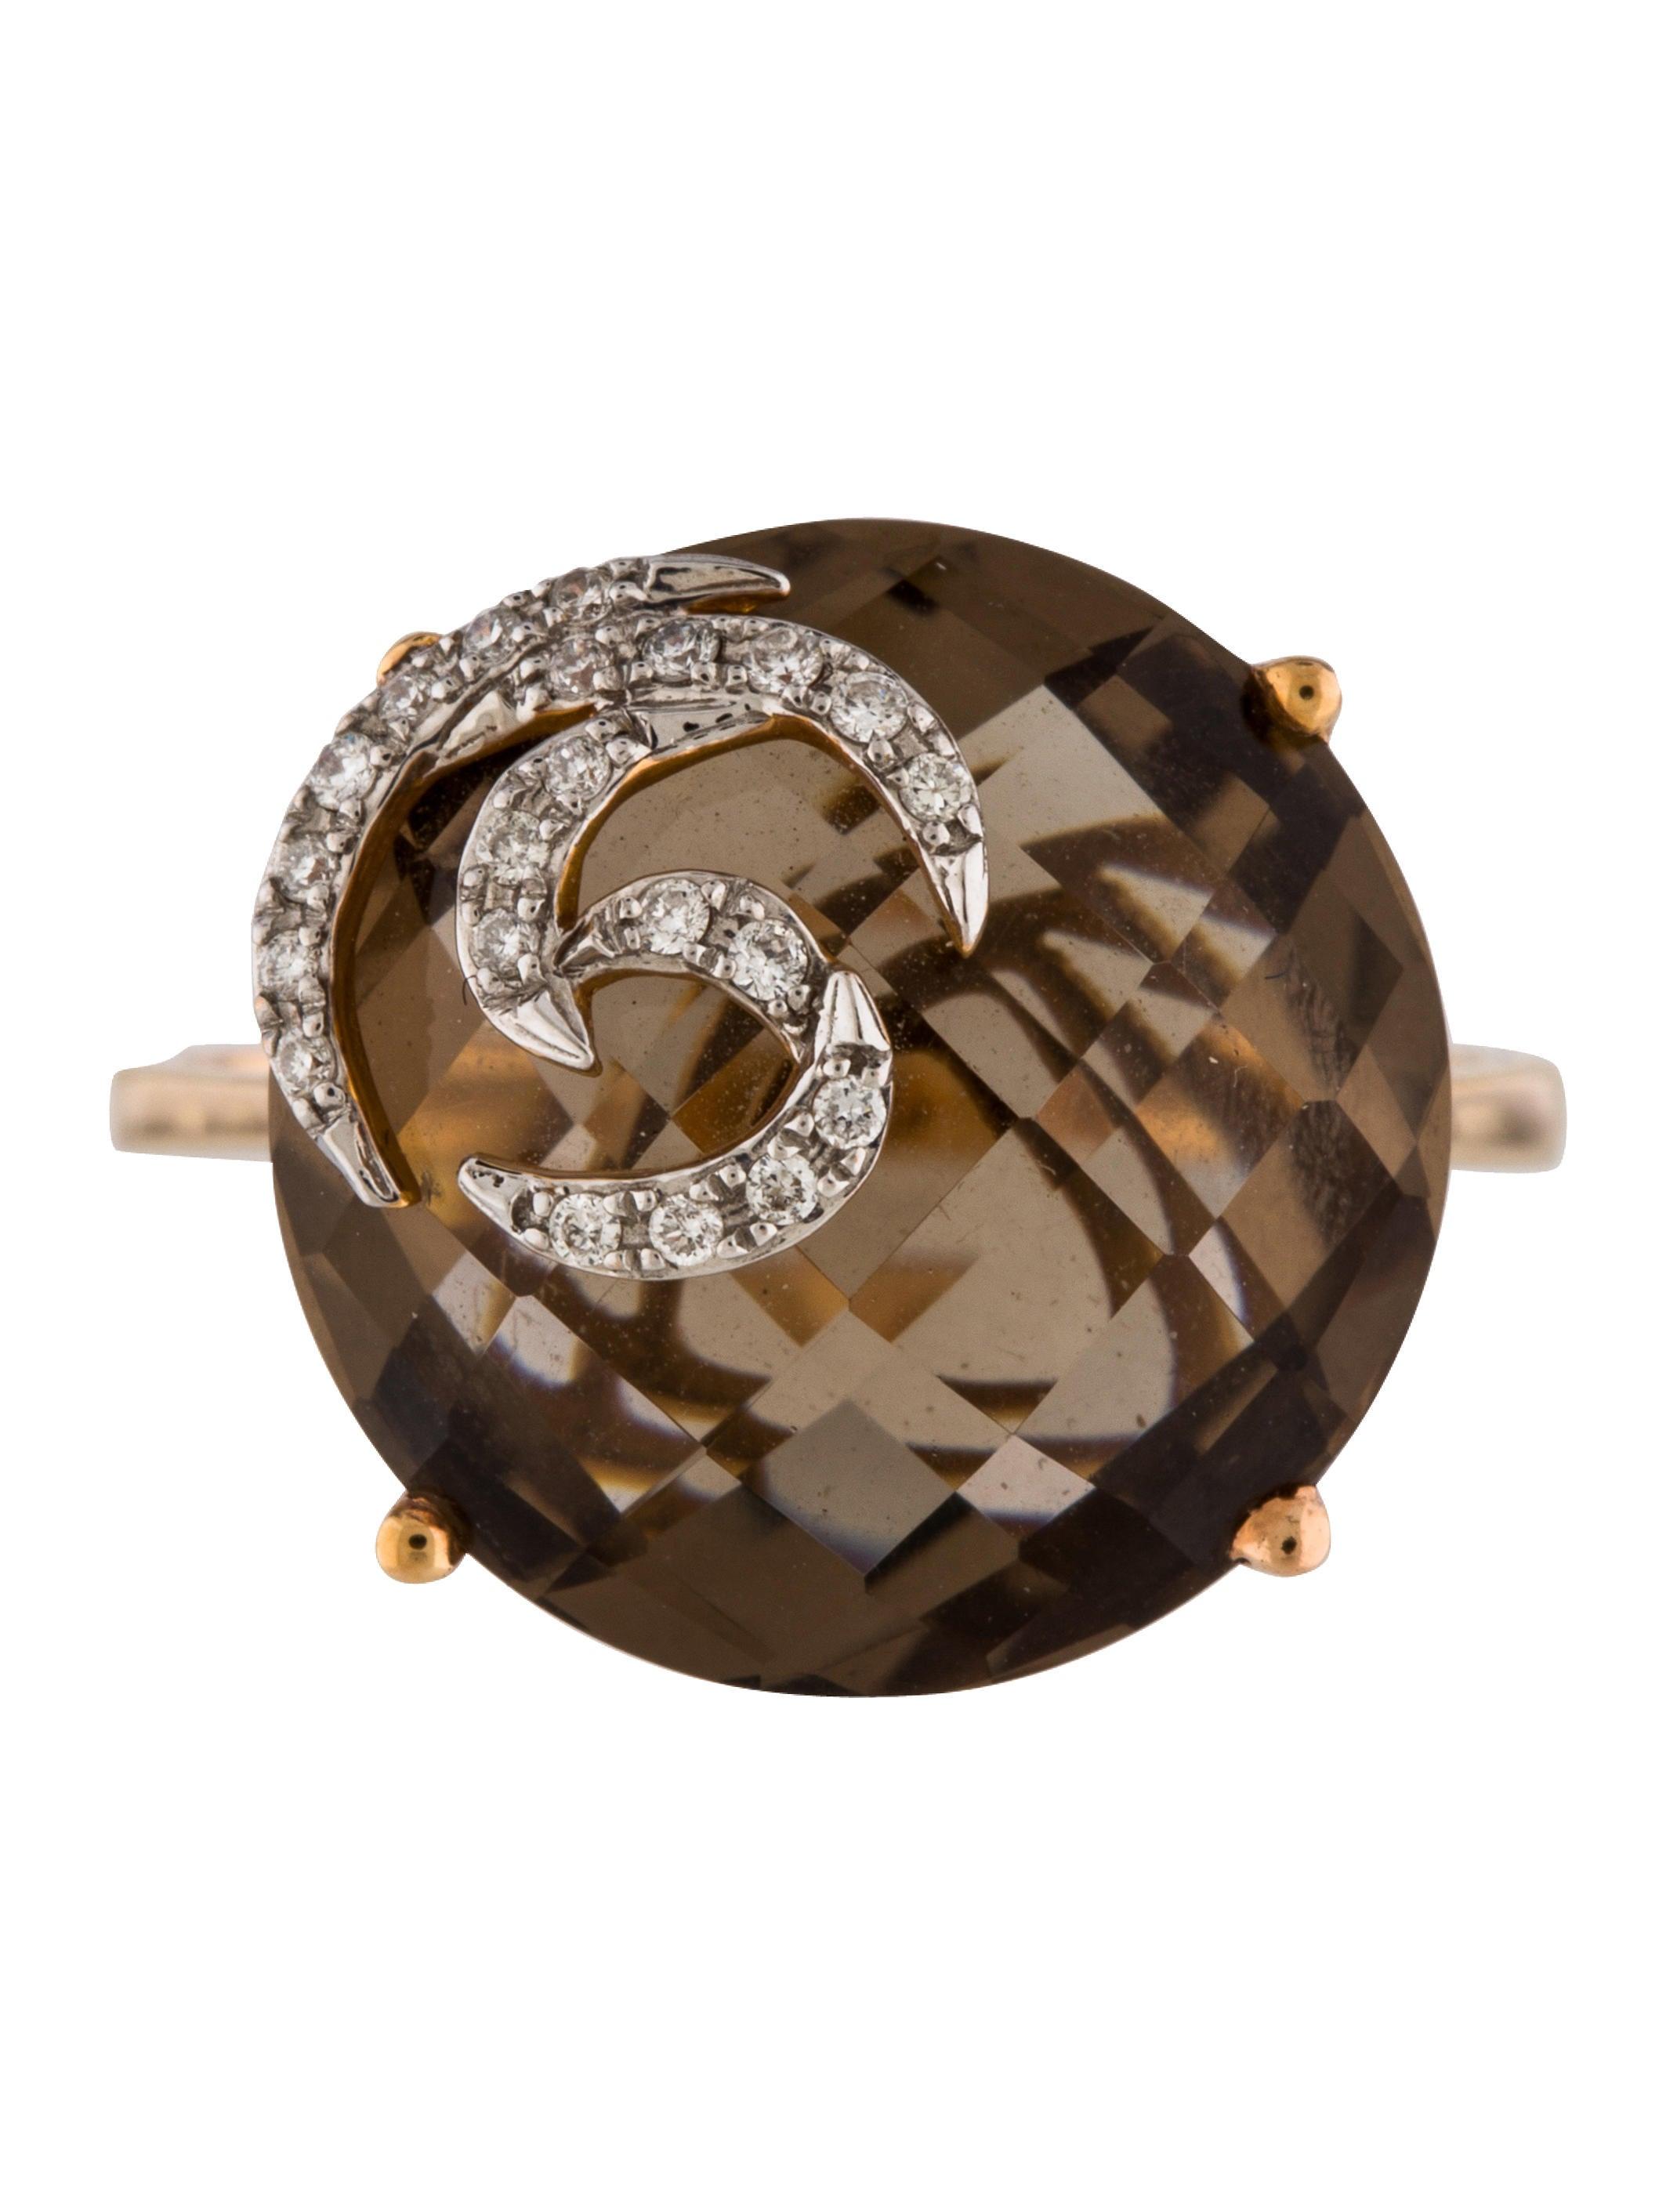 Checkerboard Smoky Quartz And Diamond Ring